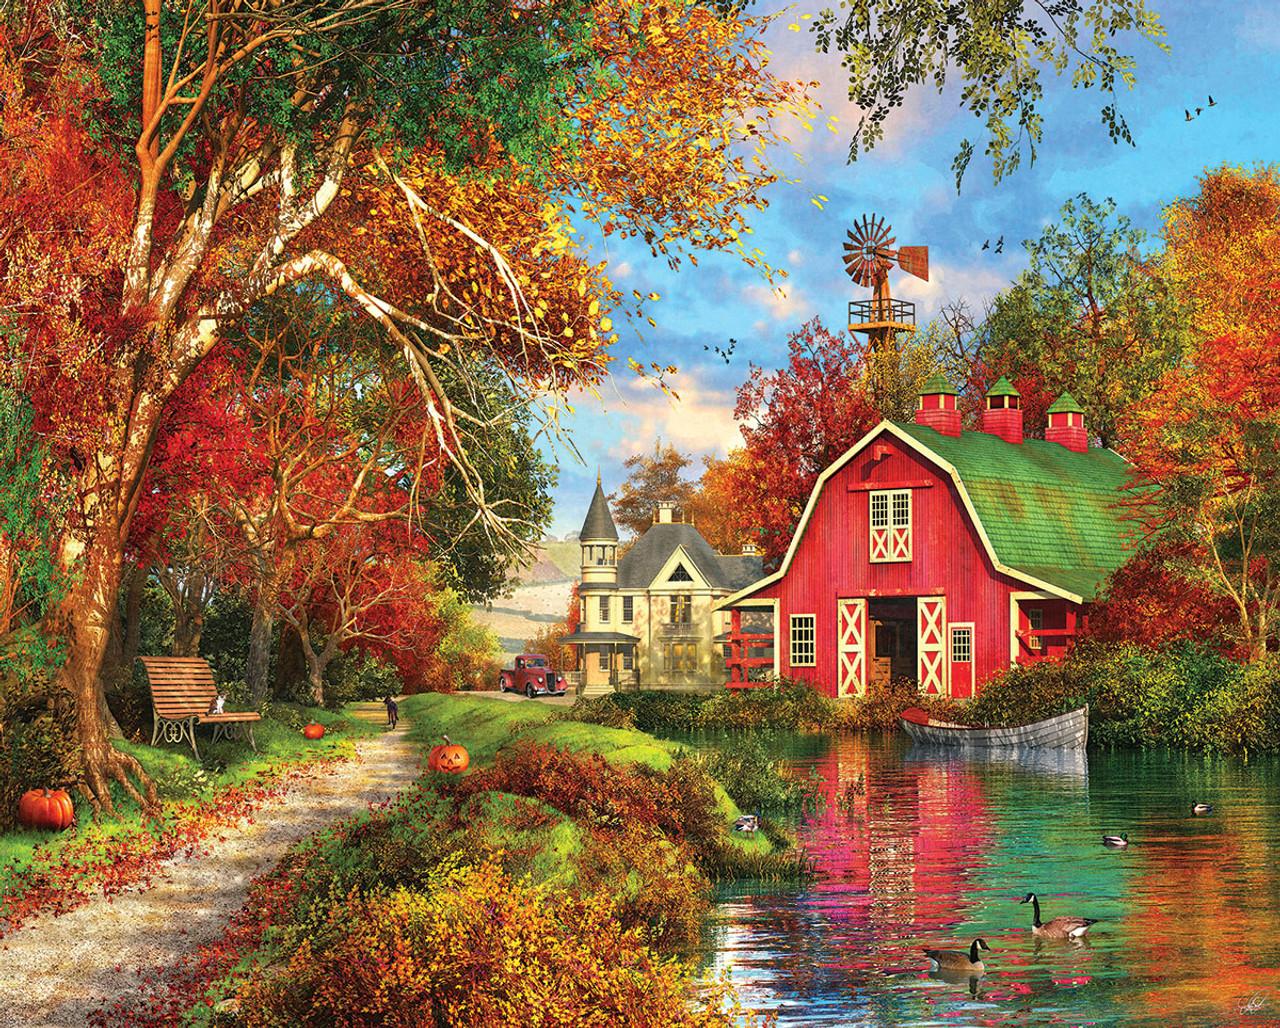 Autumn Barn 1000pc Jigsaw Puzzle By White Mountain